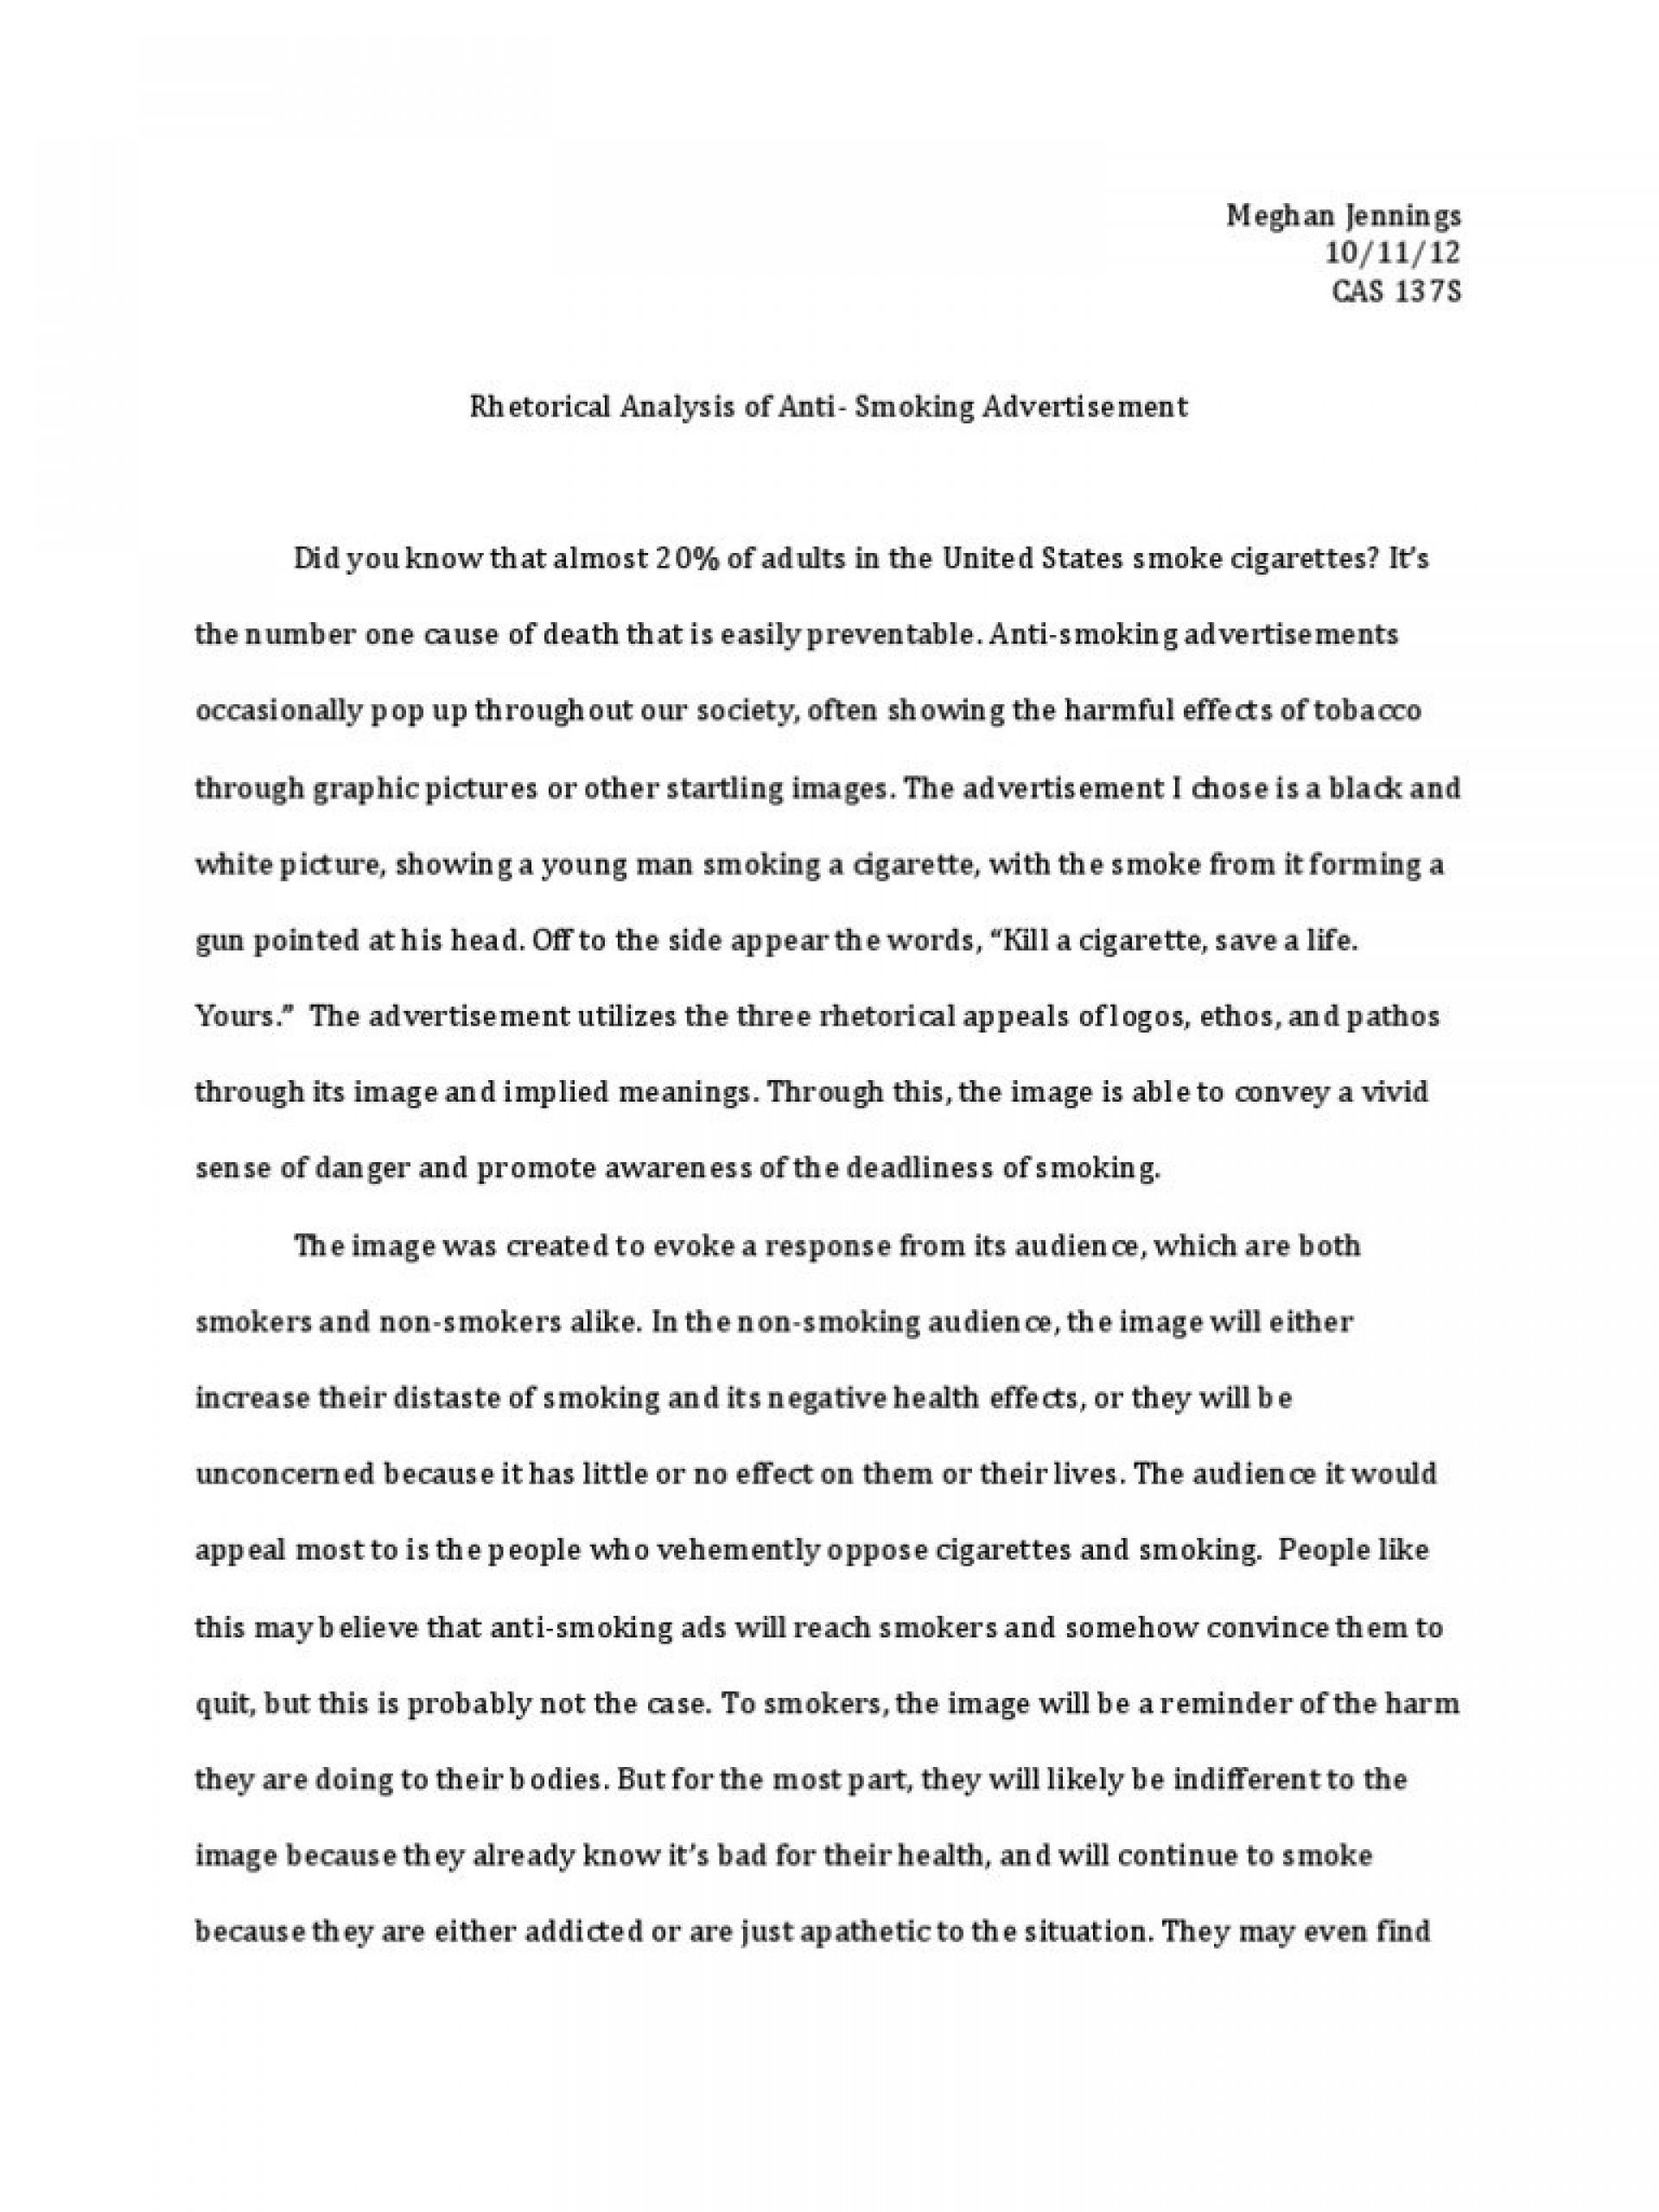 006 Quit Smoking Essay Example How To Anti Advertisement Rhetorical Fascinating 1920